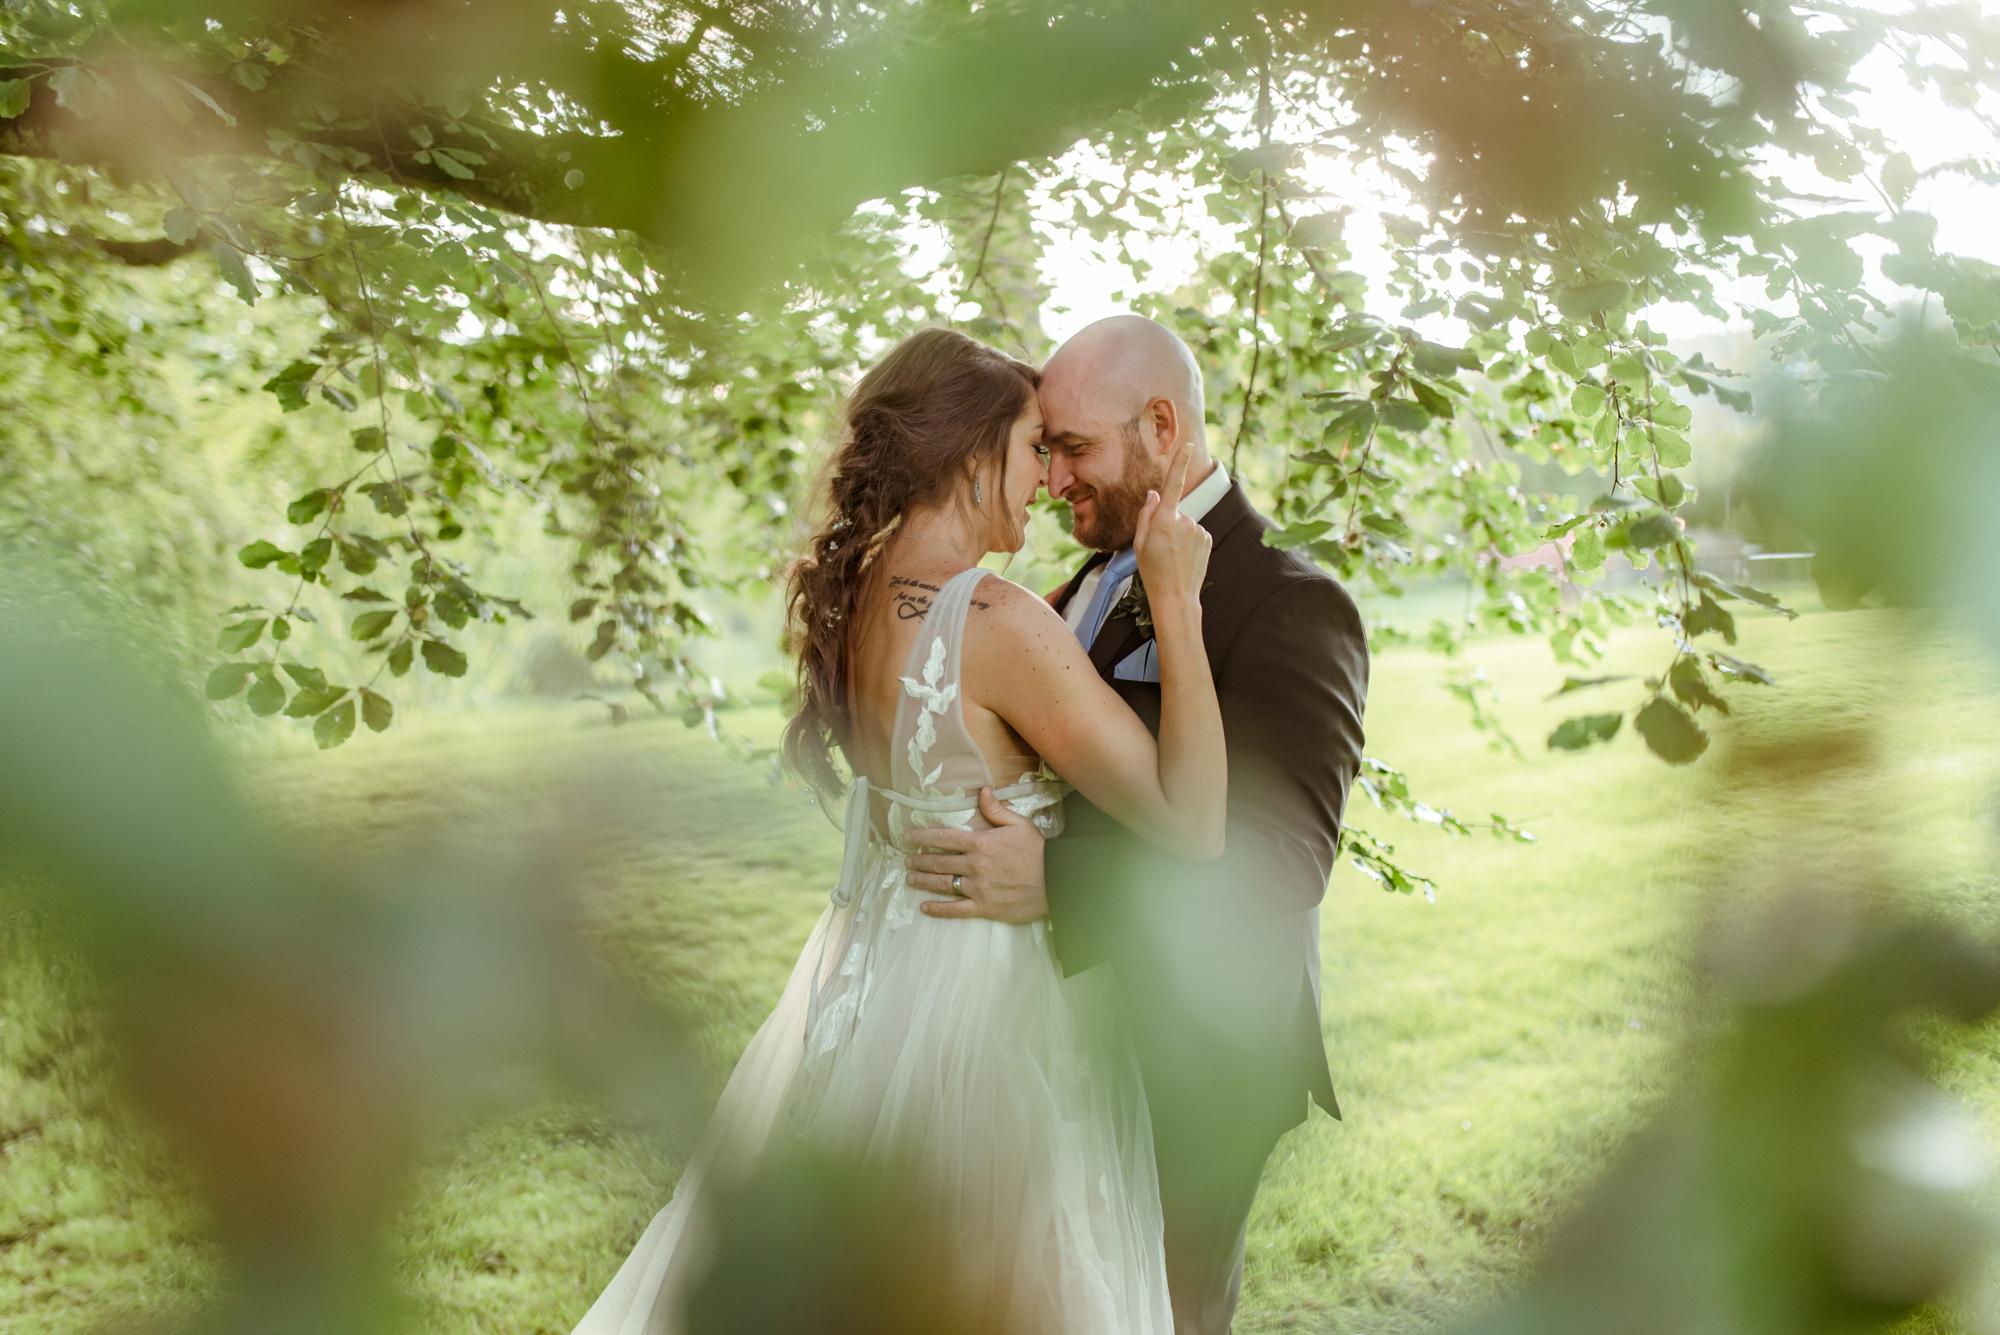 creative-wedding-photography-aberdeen.jpg